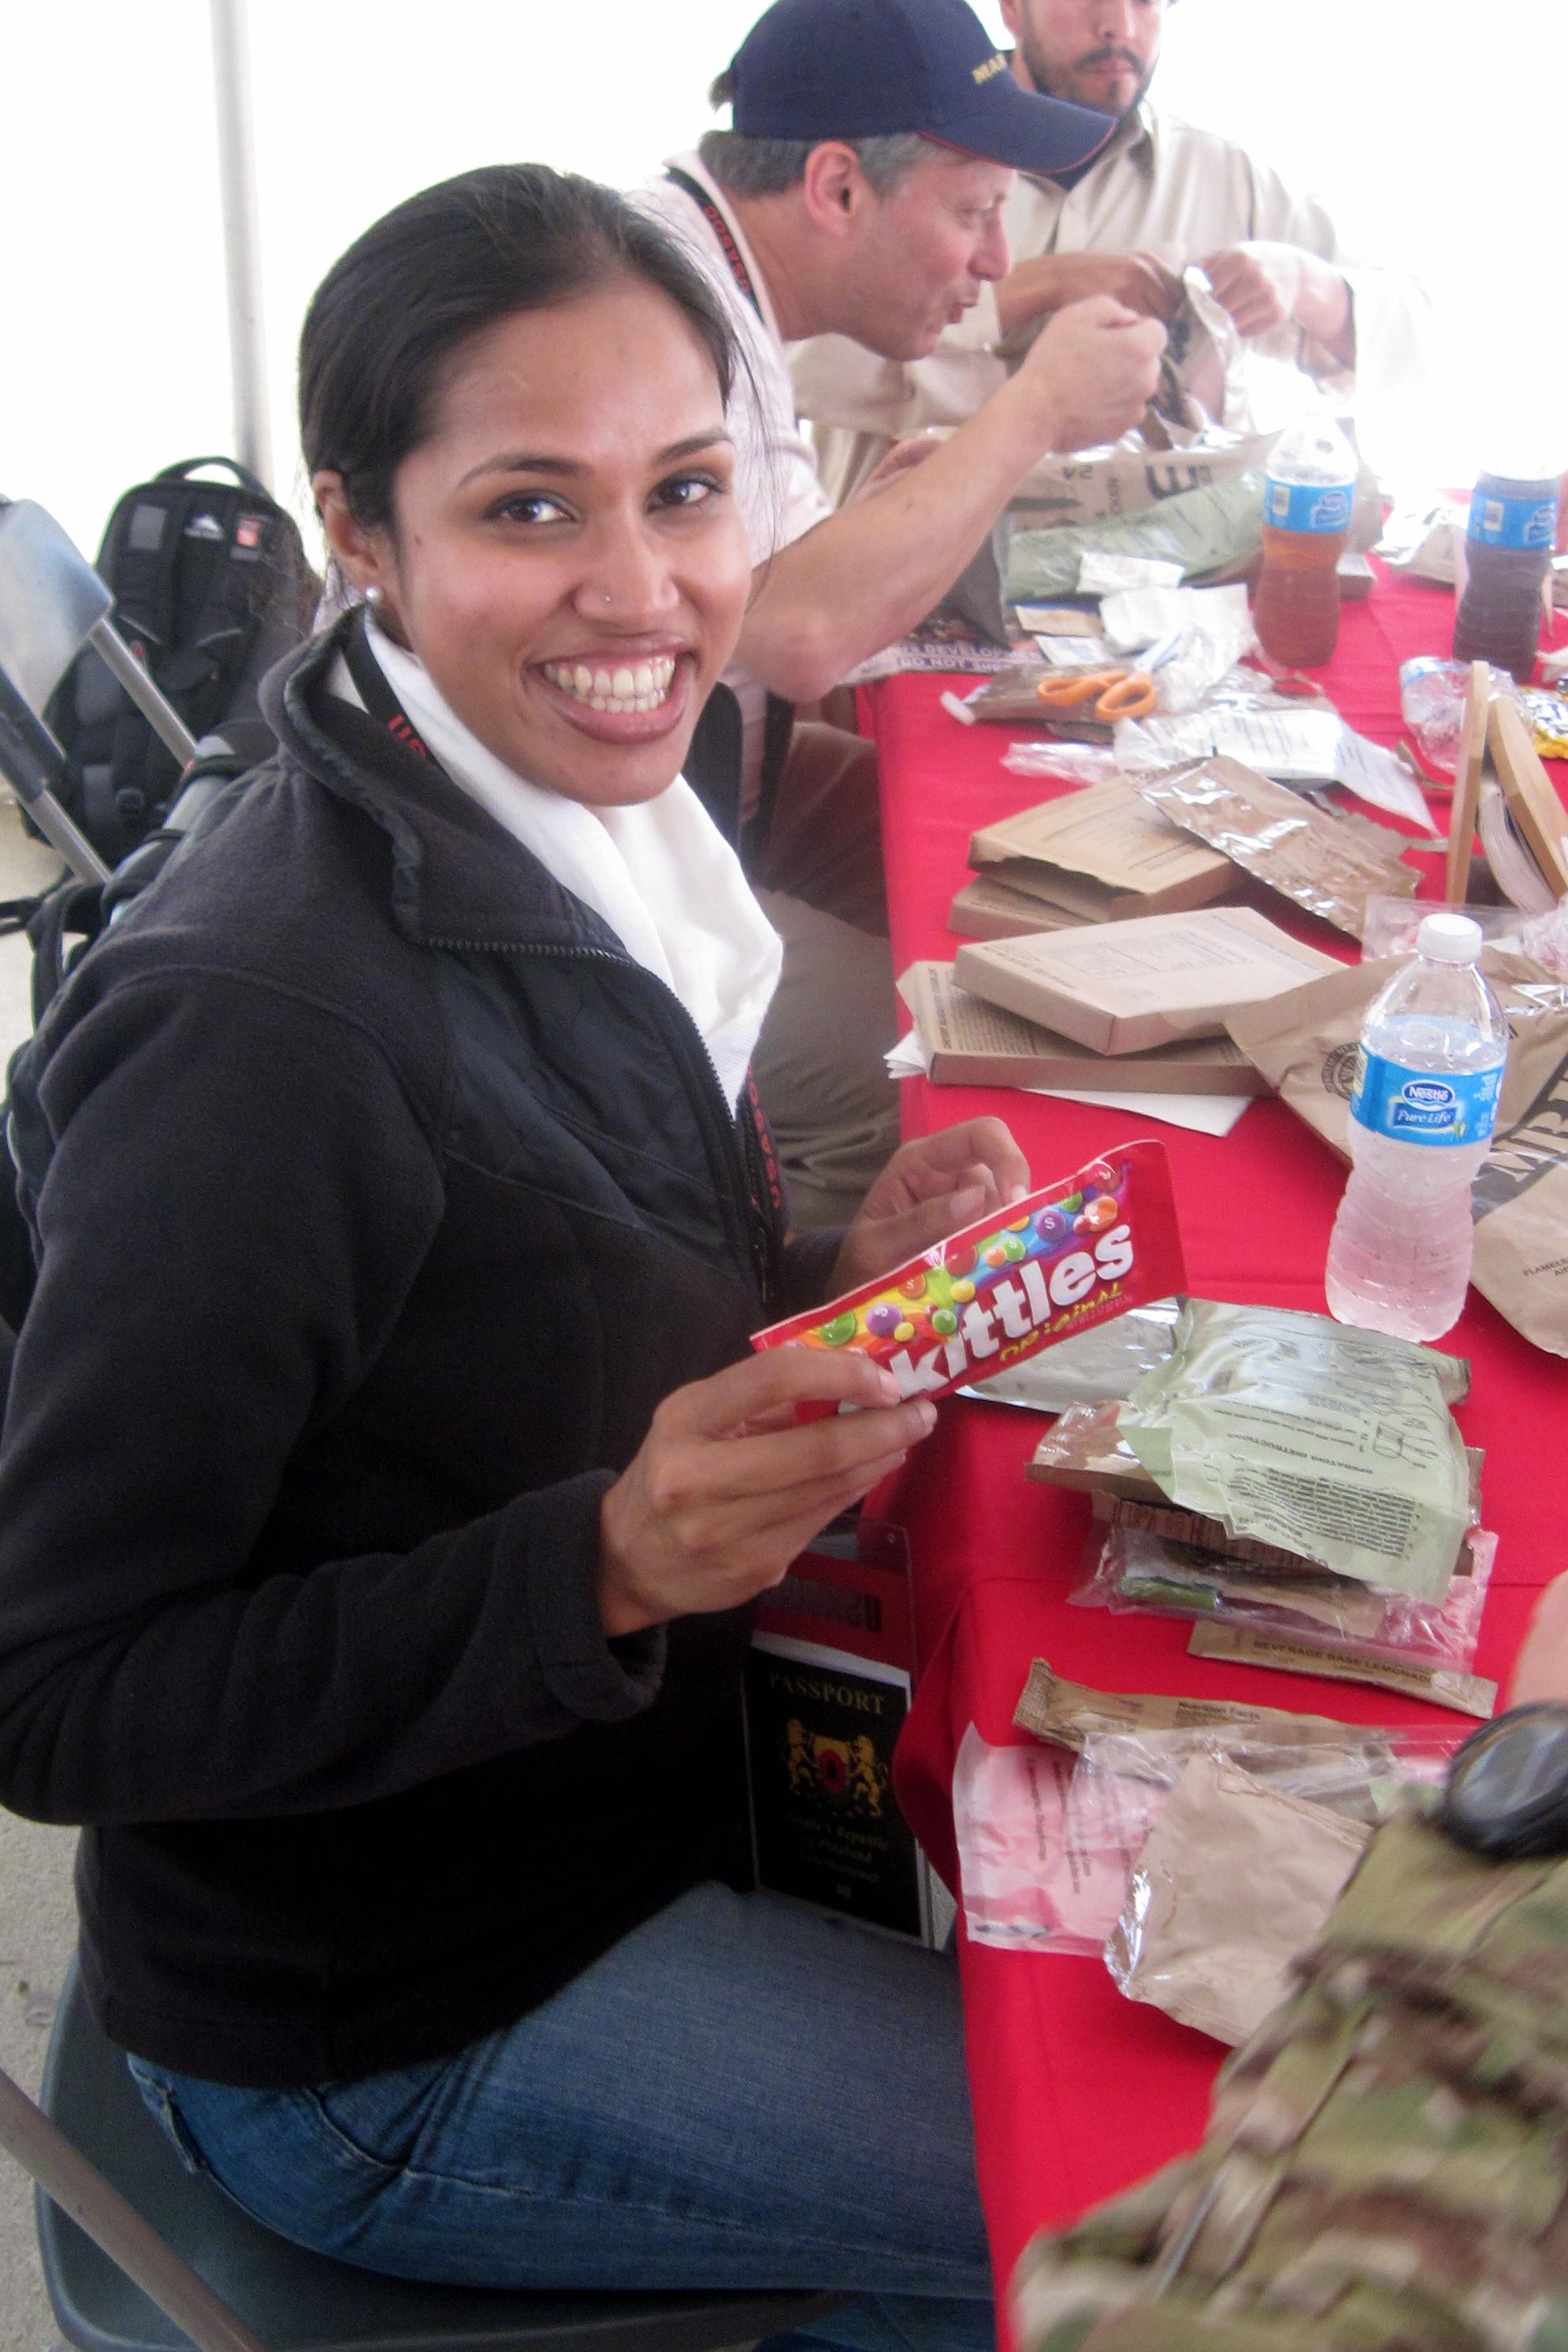 Silly #4: 'I got Skittles in my MRE!' (USASOC)